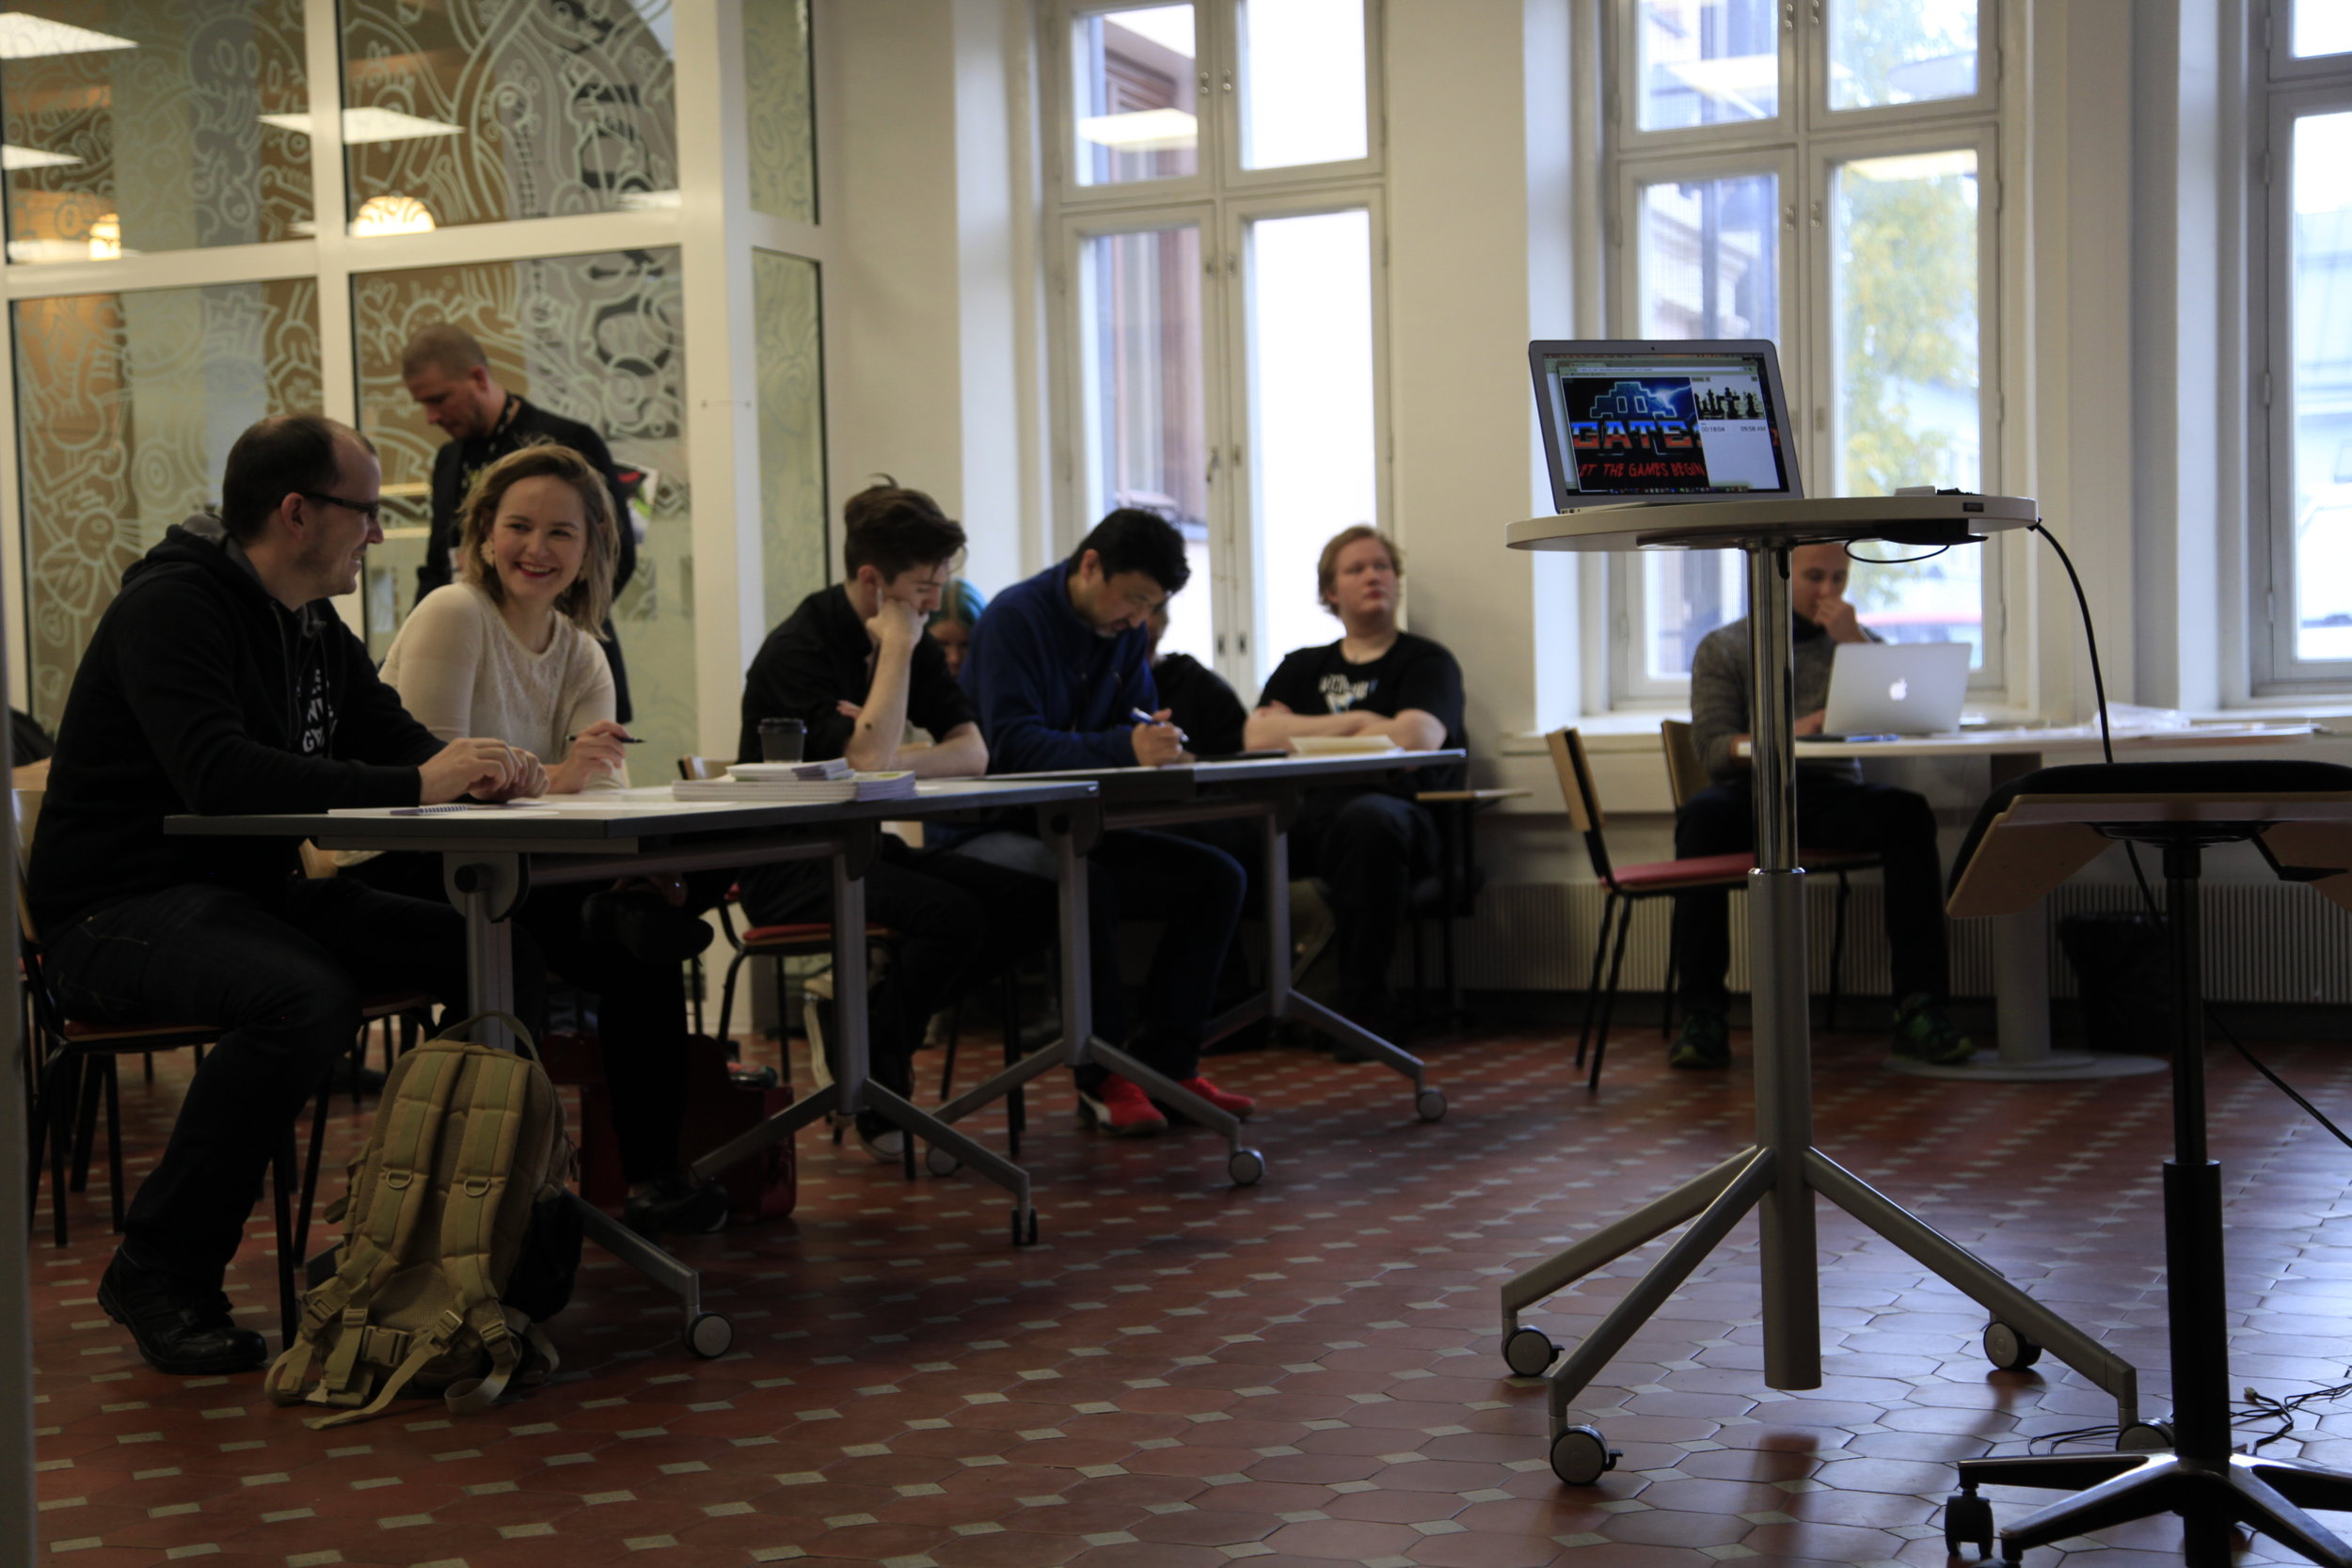 We had an awesome Jury made out of Chris,Mitsutaka Mitch Yasuda,Anne Ryynänen,Ville Autio and Martin Jaššo.